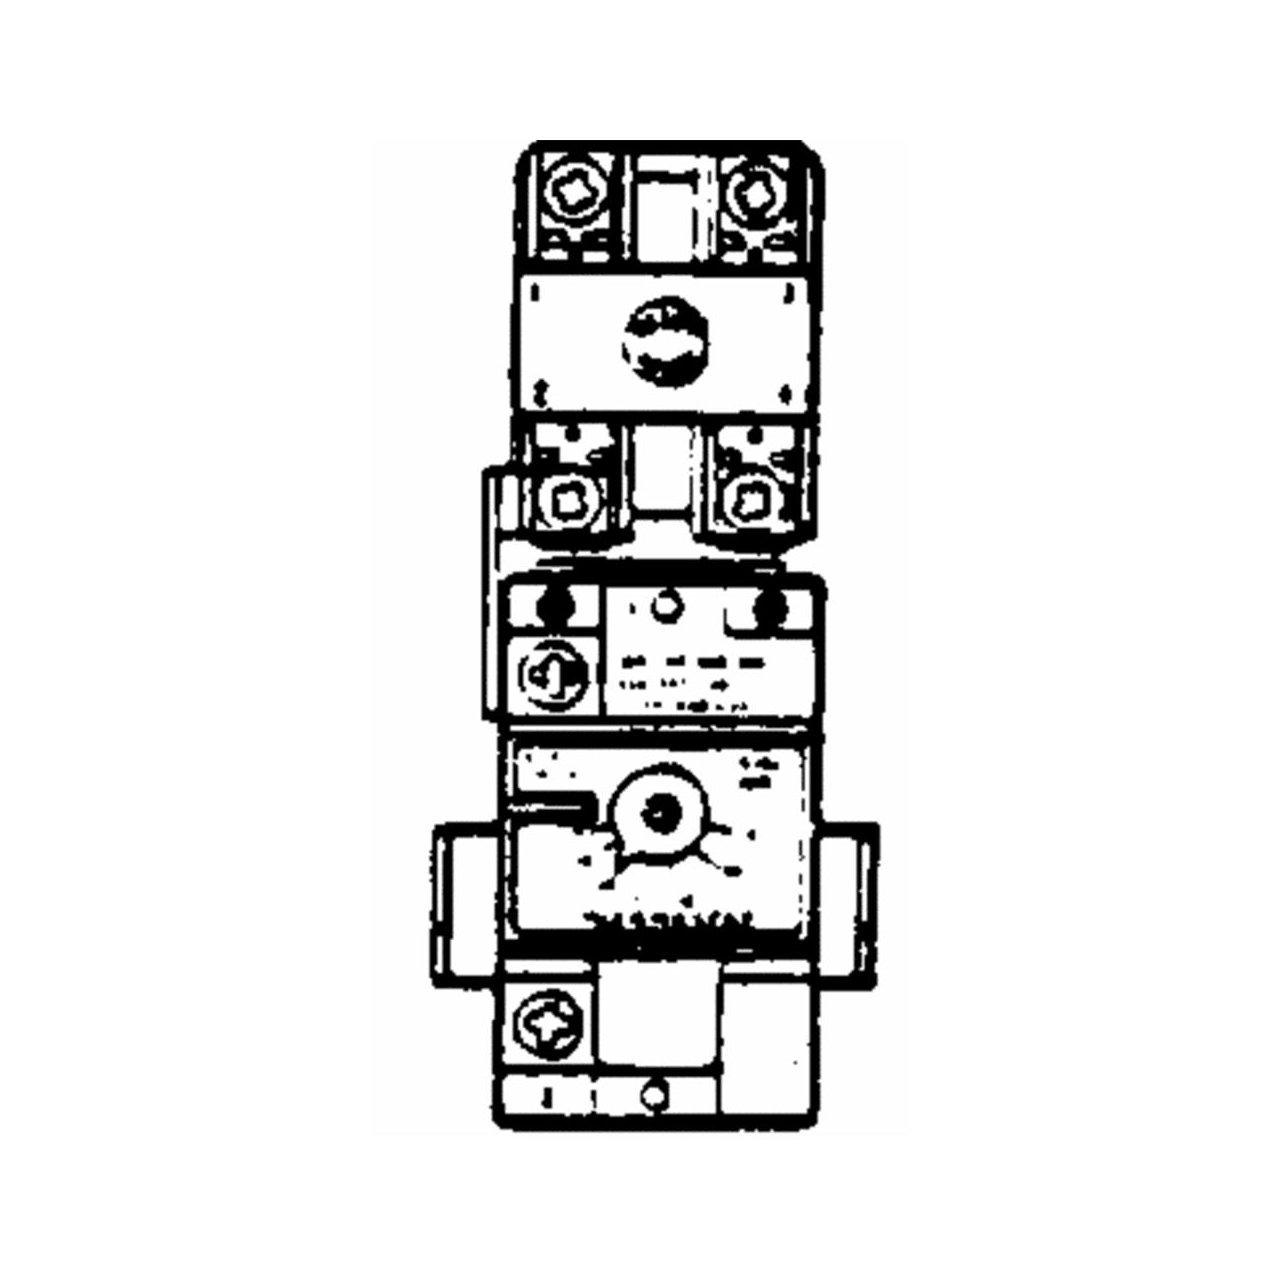 94 club car gas wiring diagram with Fahrenheat Pt2ds Wiring Diagram on 84 Honda Accord Wiring Diagram as well 1984 1991ClubCarGas in addition Club Car Micro Switch Wiring Diagram Free Picture as well Club Car Carryall 2 Wiring Diagram as well 1984 1991ClubCarGas.